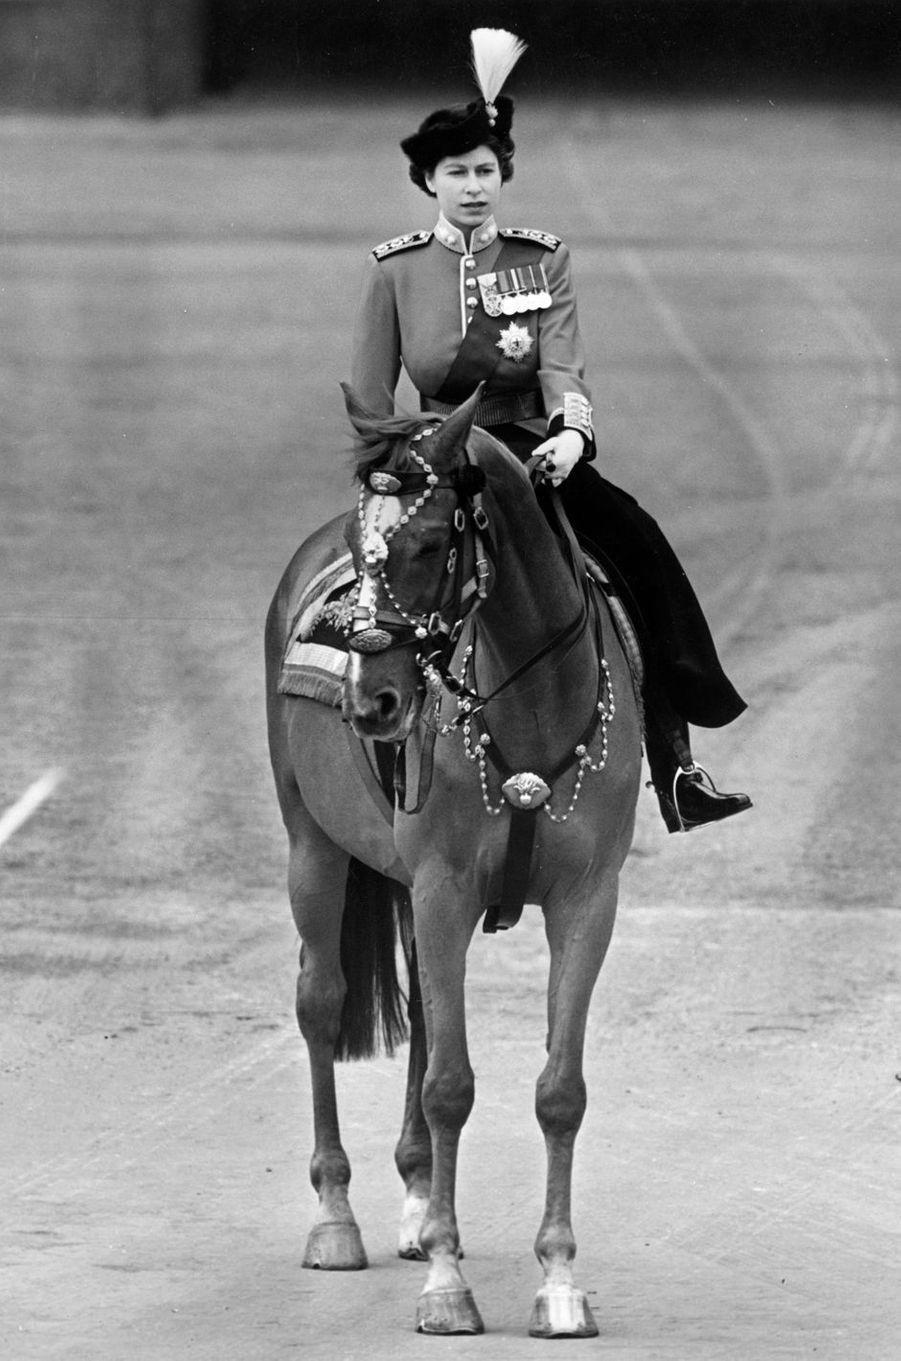 La princesse Elizabeth d'Angleterre (futur reine Elizabeth II), en 1951